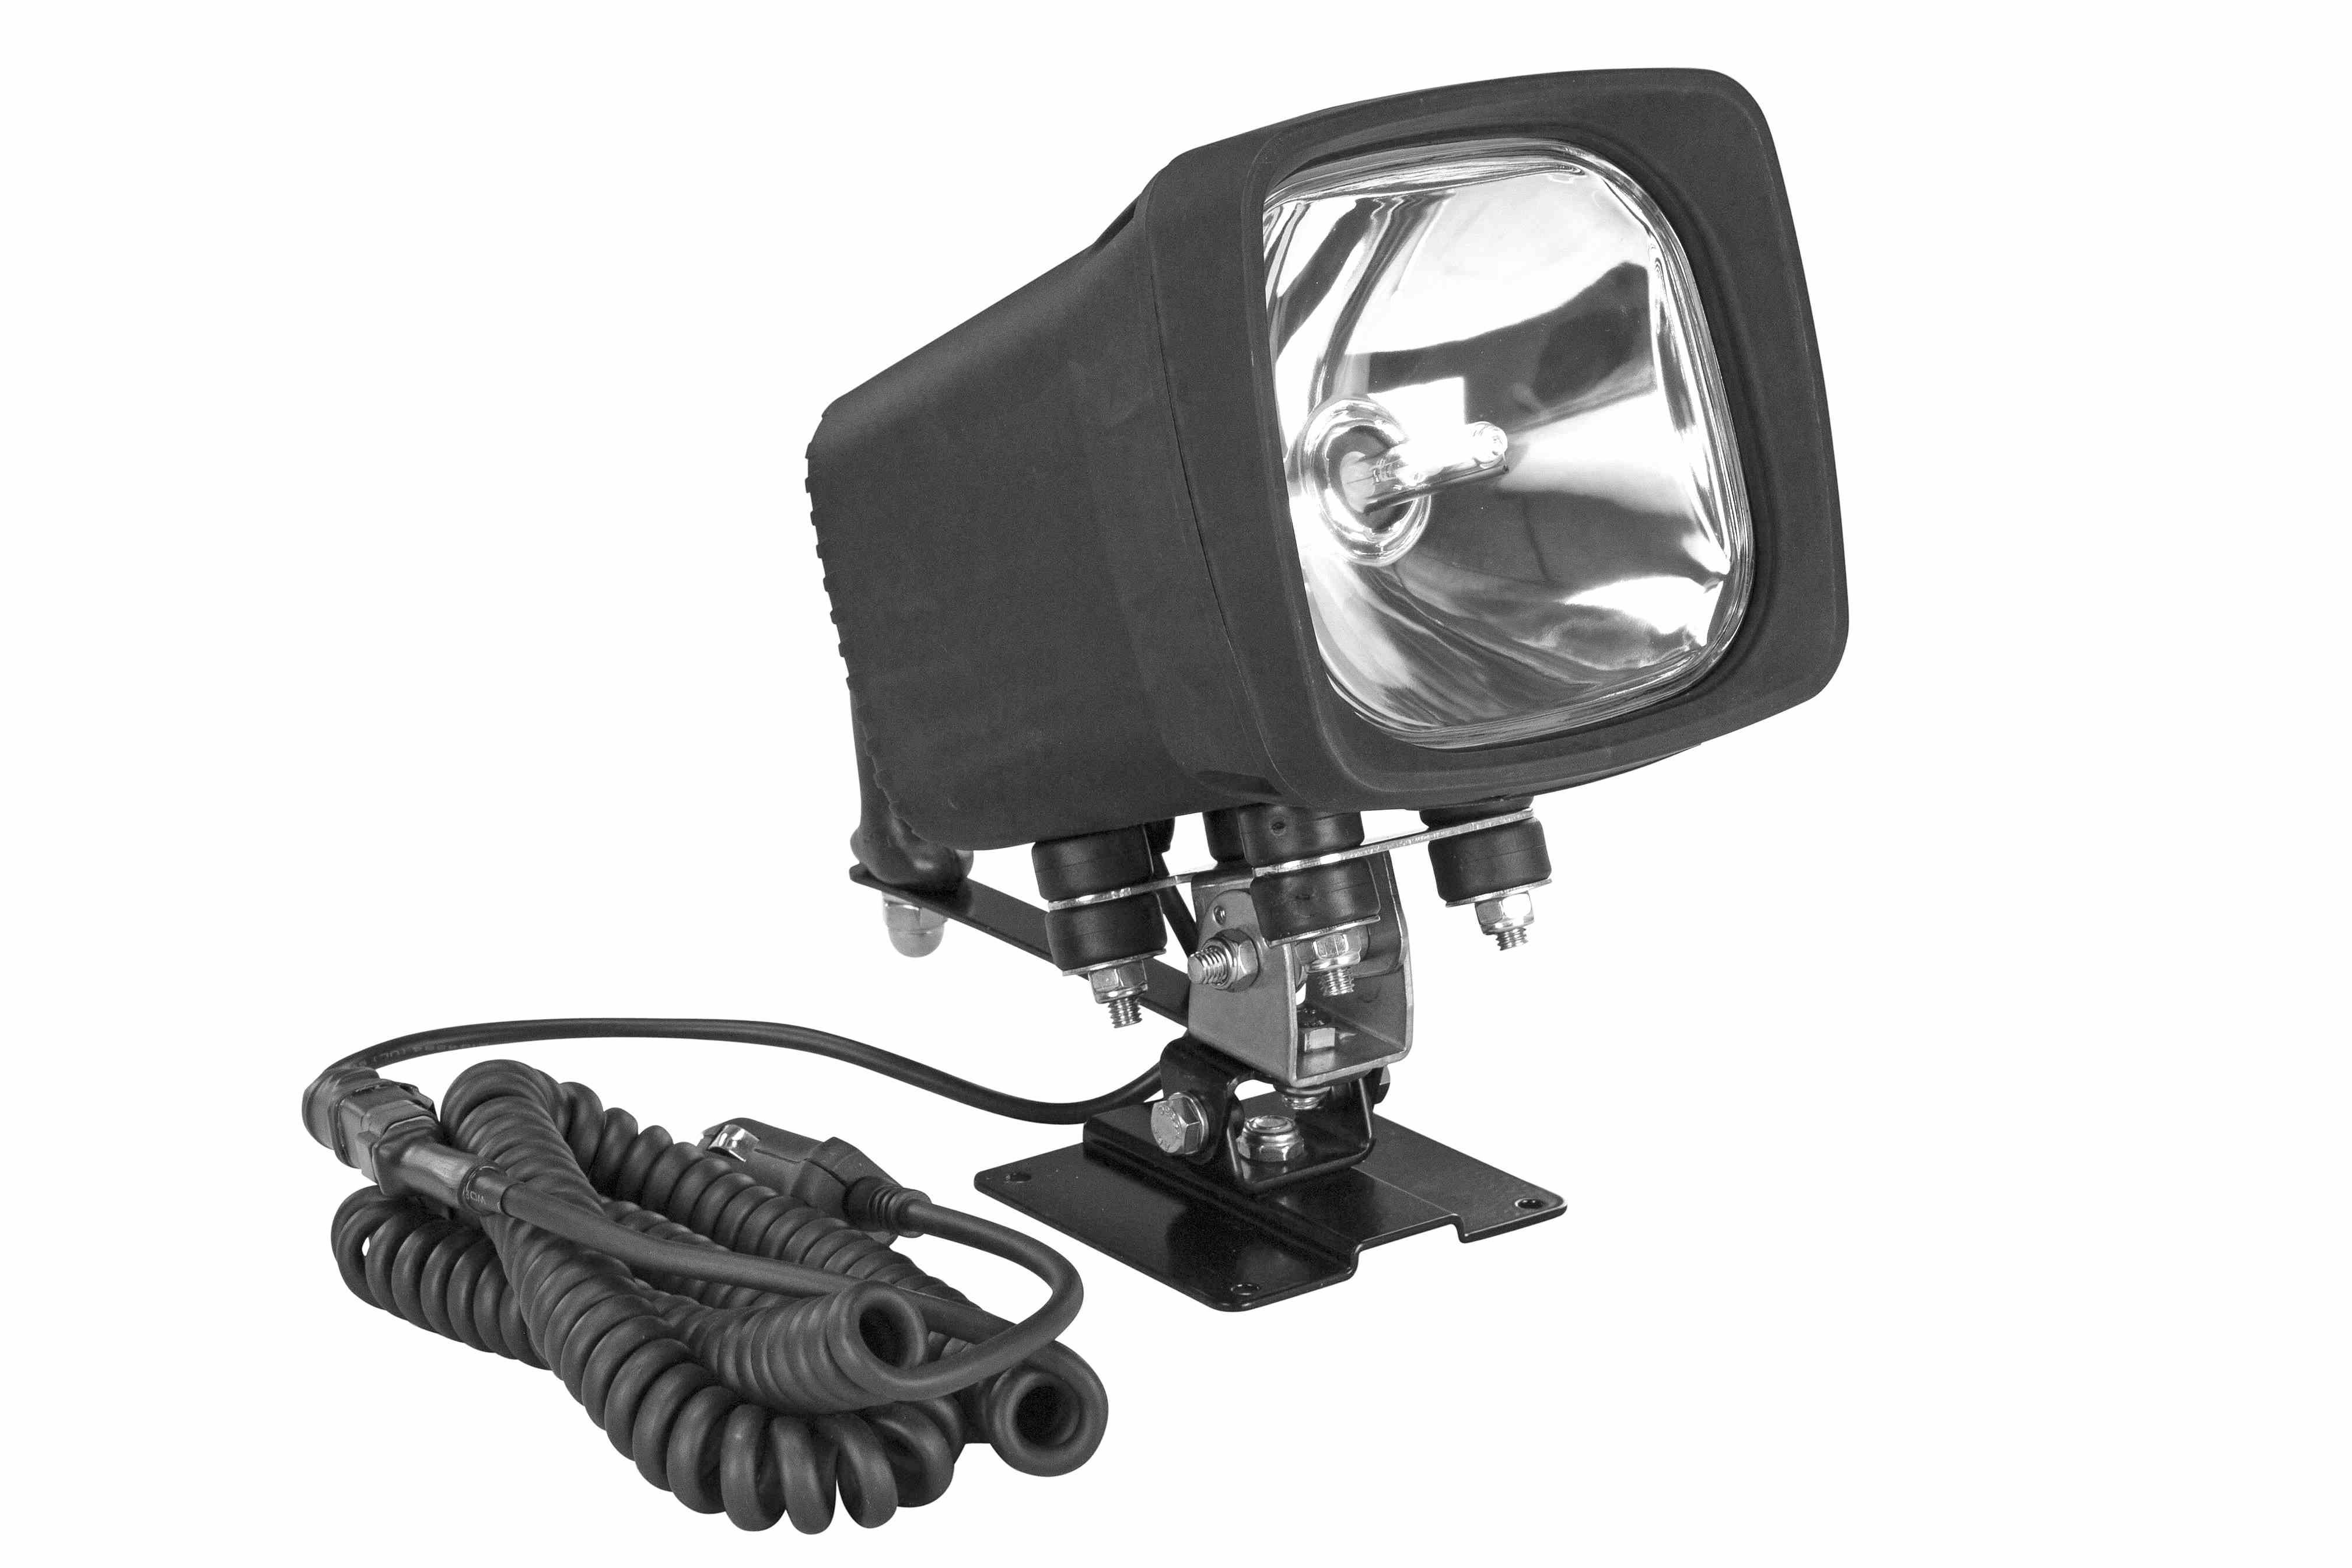 Hid Controlight Permanent Mount Light